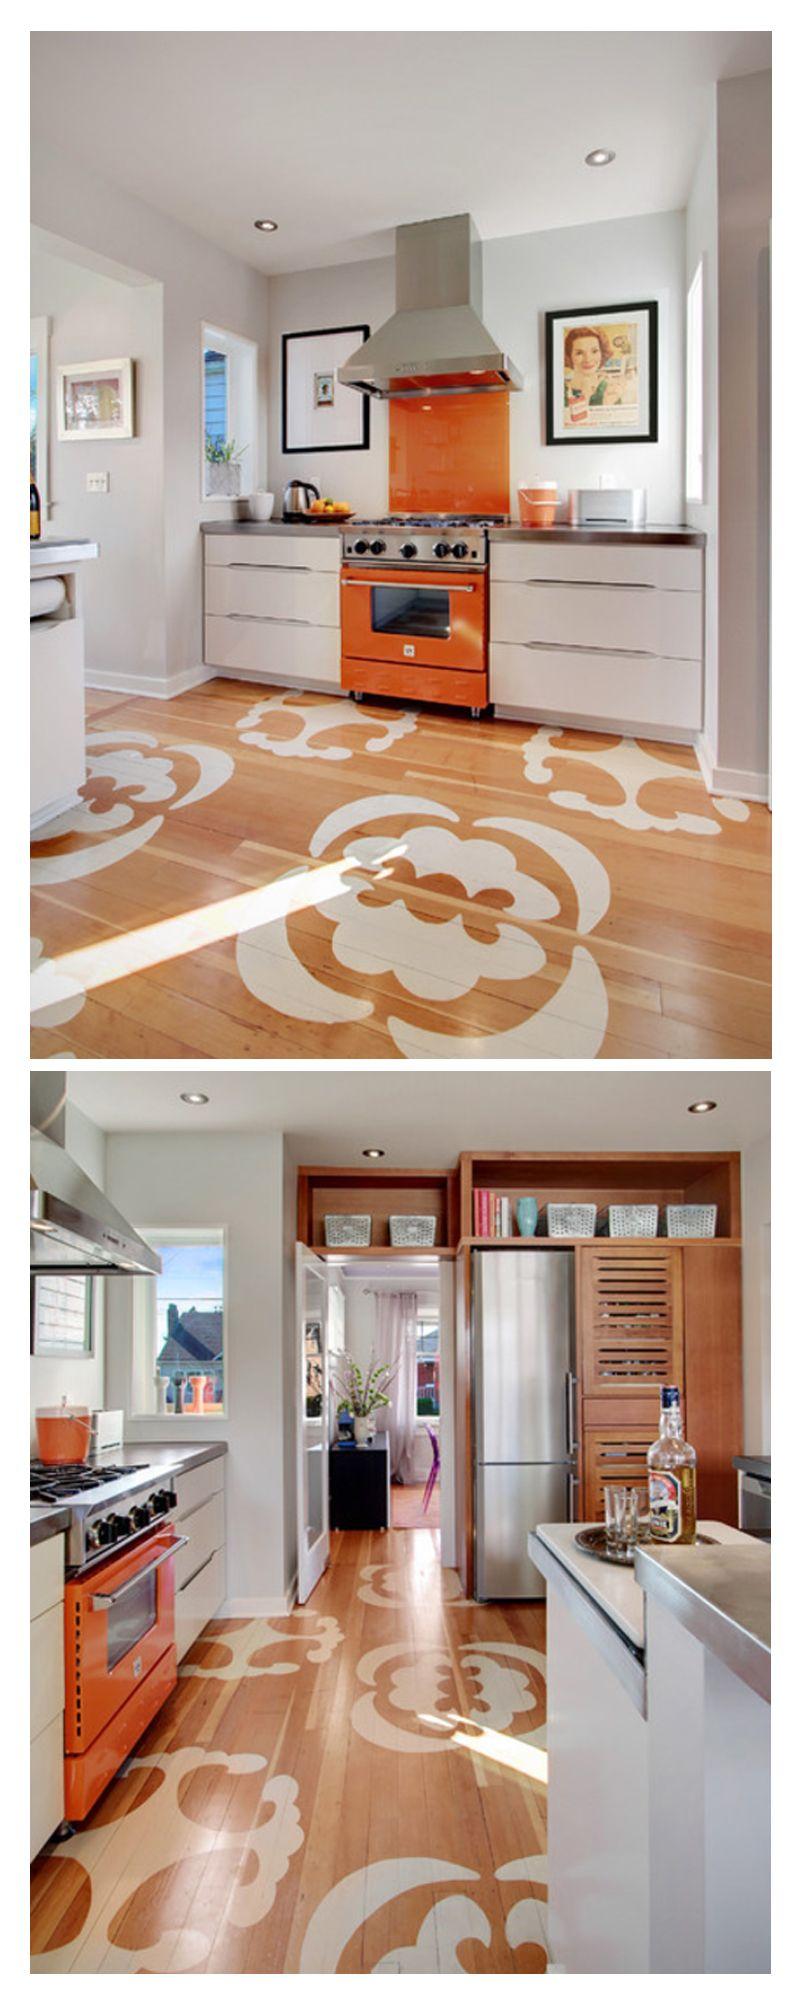 Design Your Own Kitchen: Kitchen Design, Kitchen, Home Decor